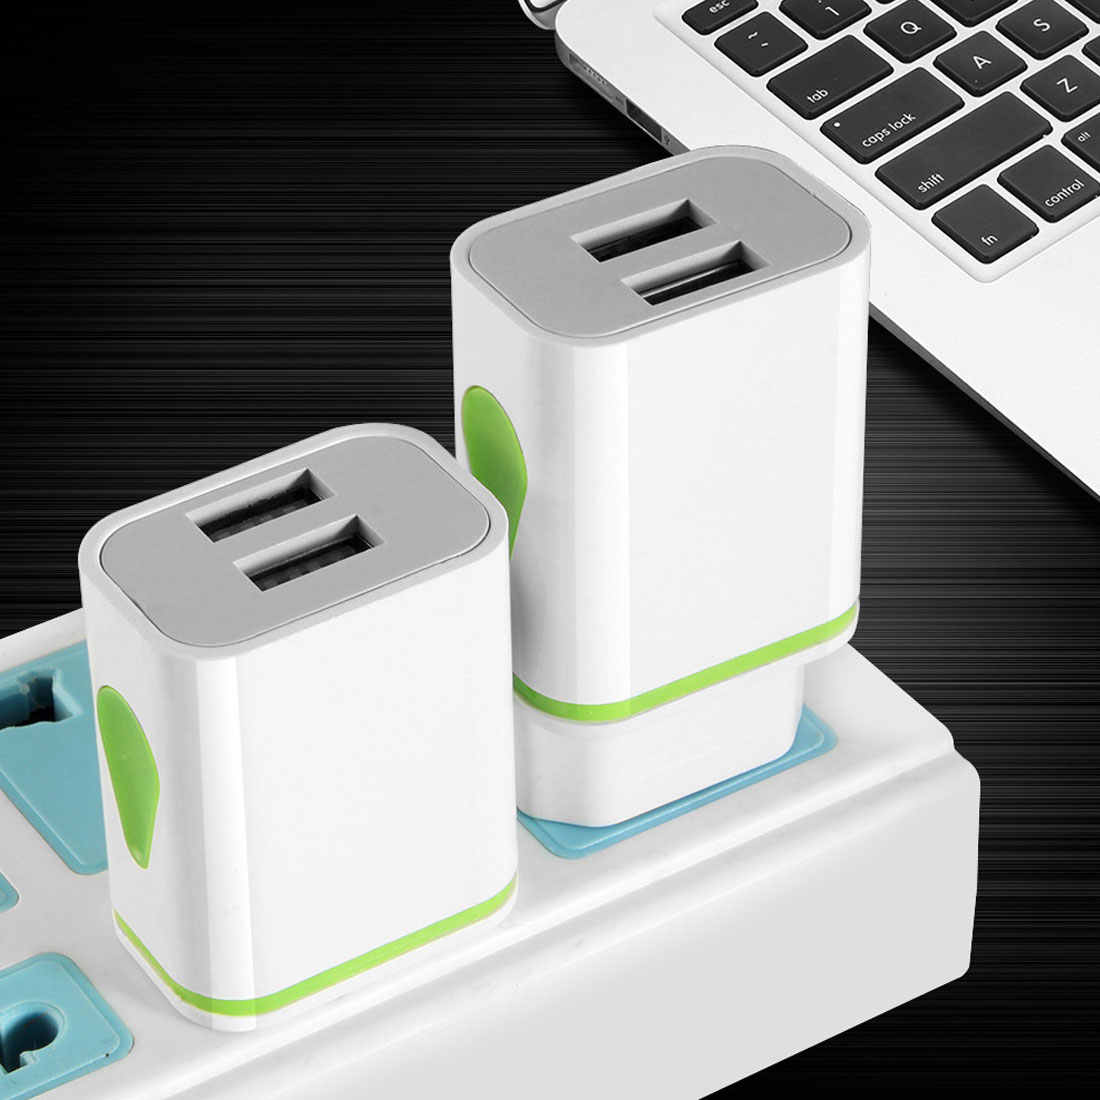 USB Dual Charger Adaptor Kami Perjalanan Uni Eropa Indikator LED Putih untuk Iphone Samsung Xiaomi Tablet iPad USB Dinding Charger USB tipe C HUB